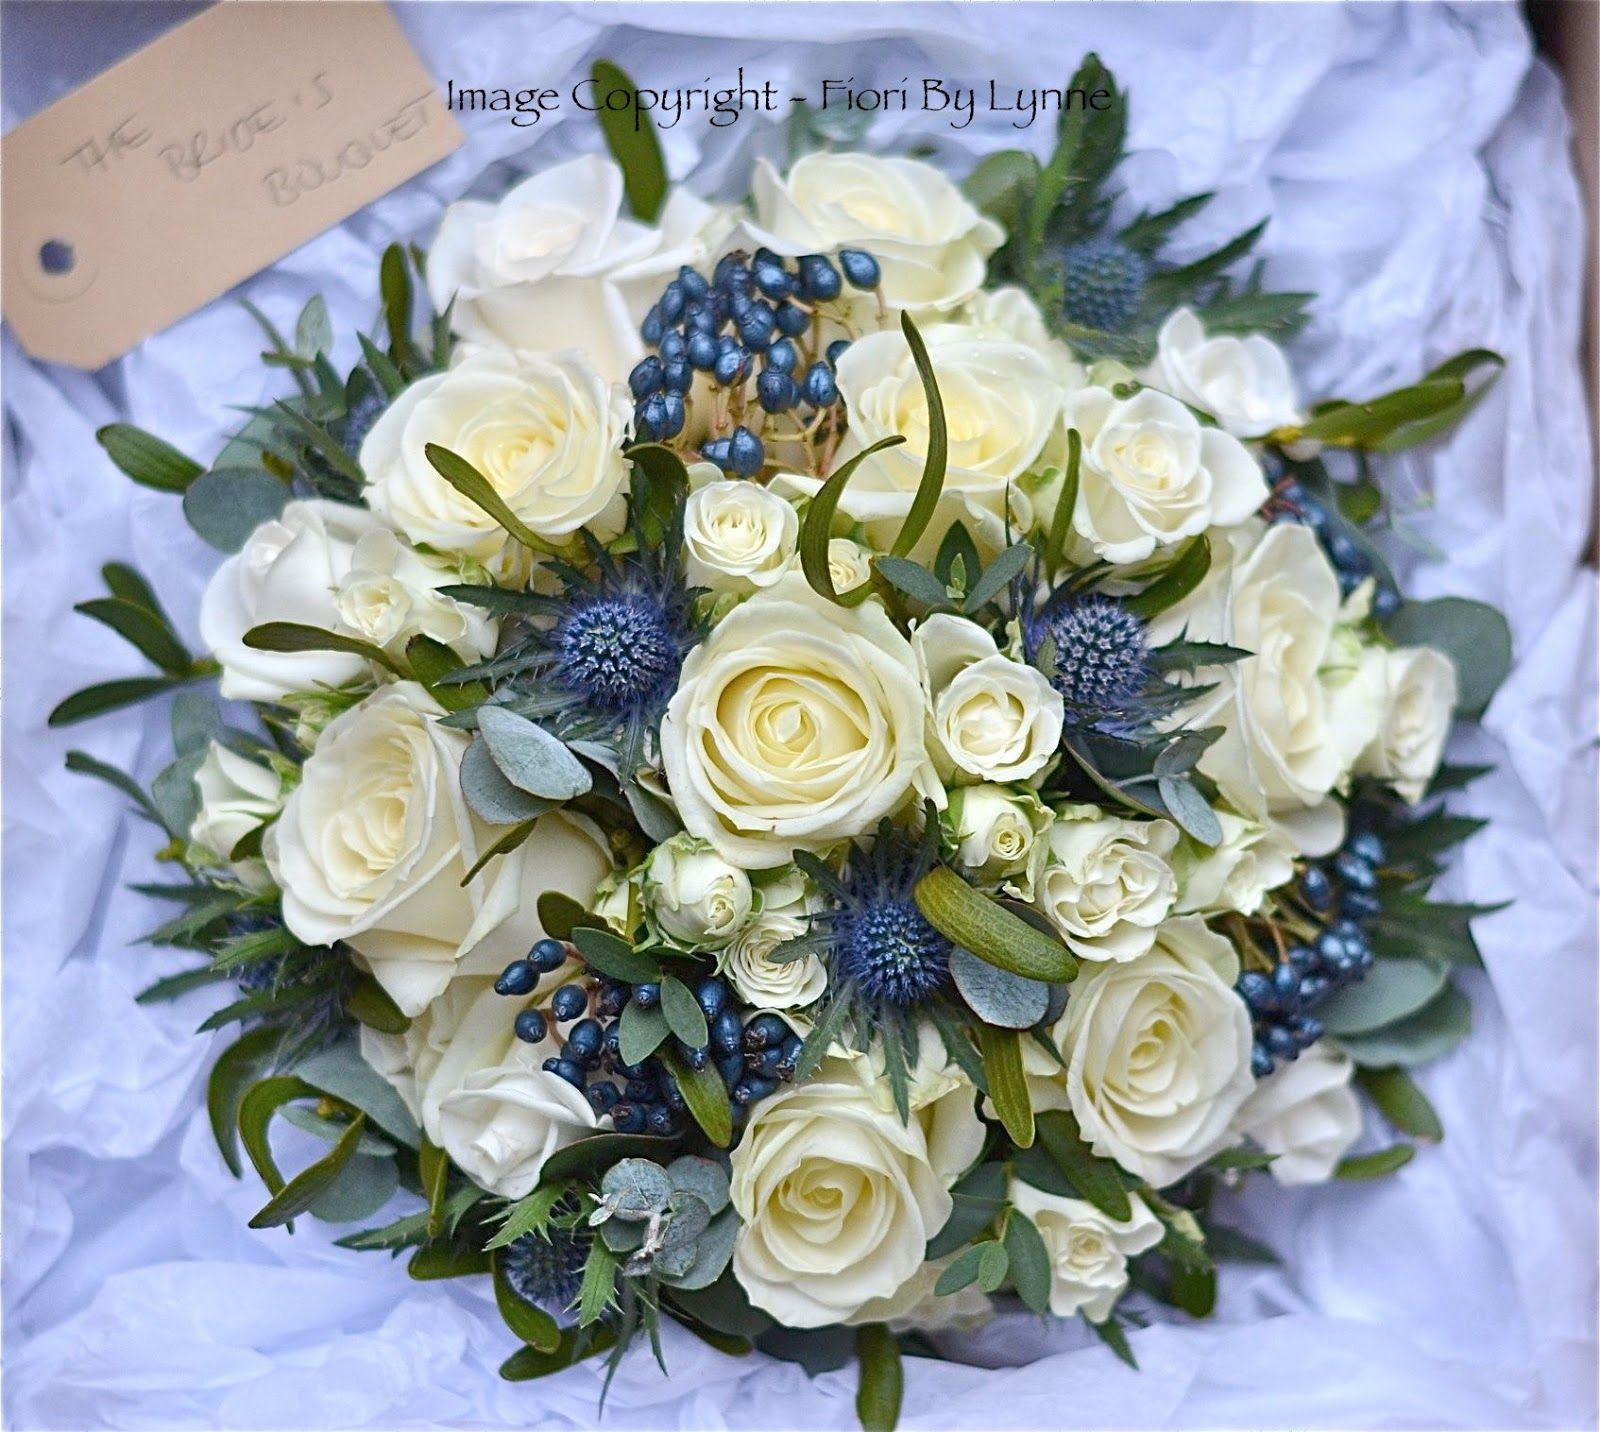 Wedding bouquet of ivory roses thistles navy berries eucalyptus wedding bouquet of ivory roses thistles navy berries eucalyptus and mistletoe perfect izmirmasajfo Choice Image